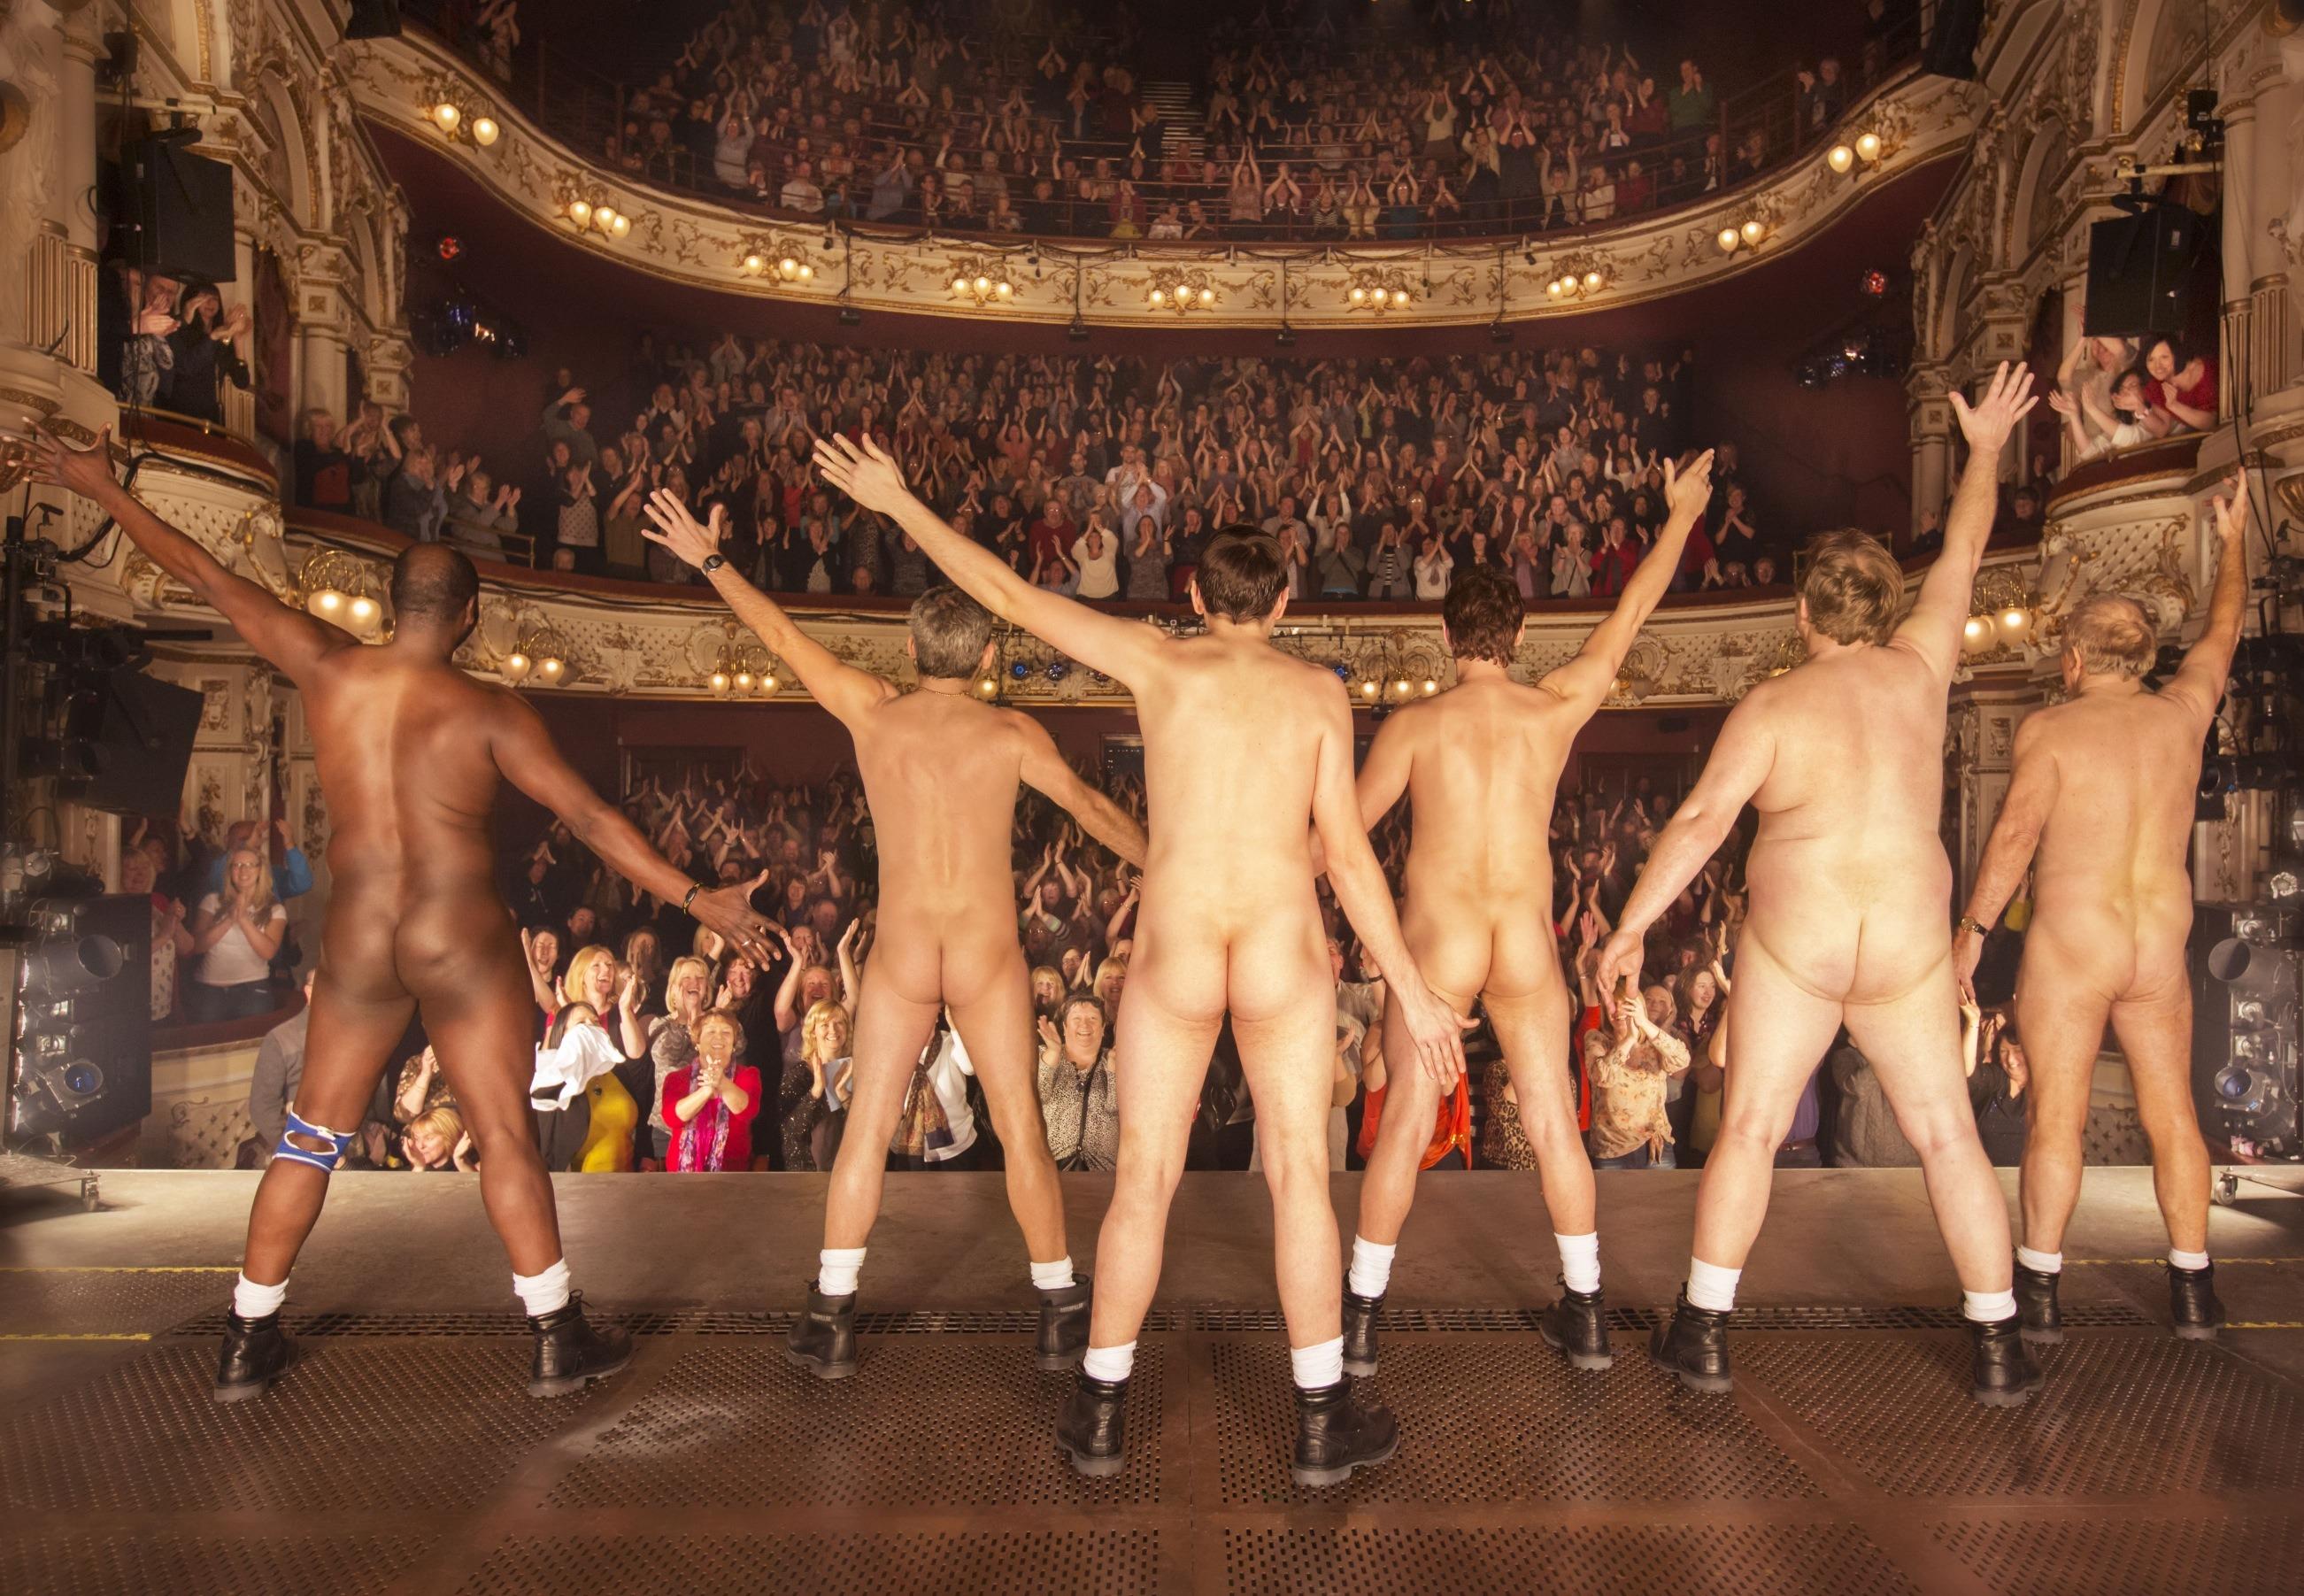 Chicago Gay Bars: Go-go boys/strippers